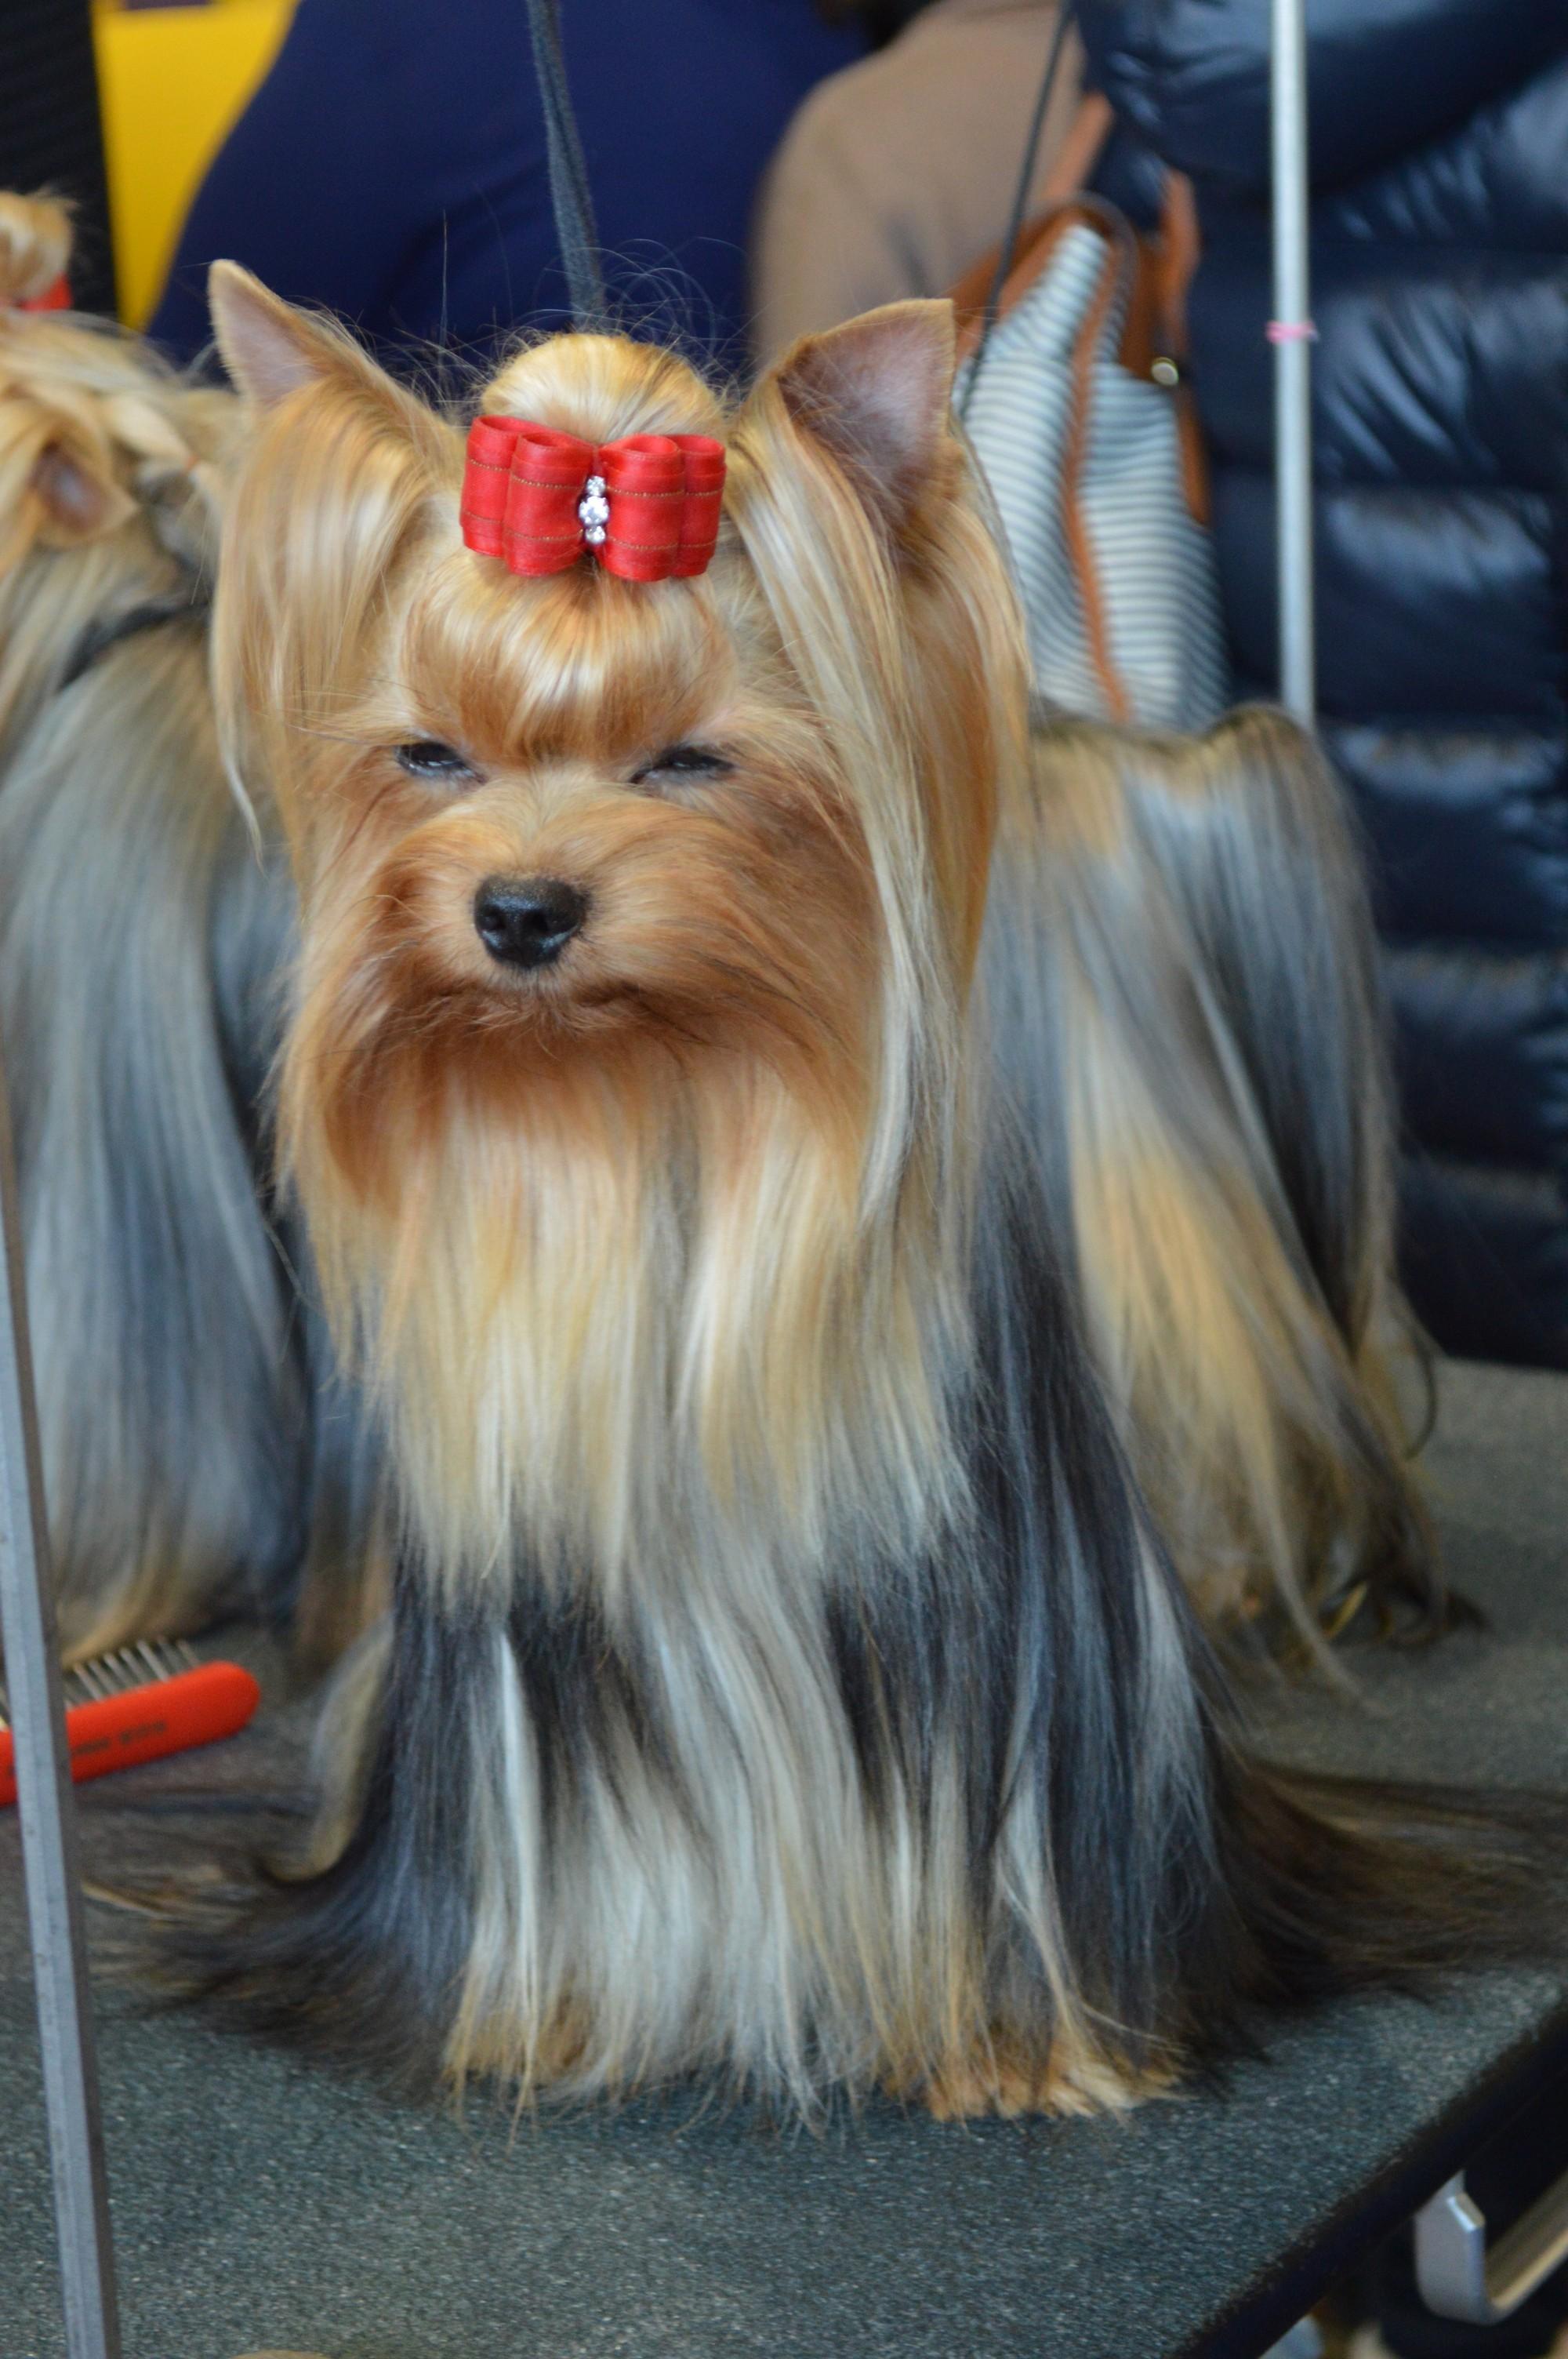 Fileyorkshire Terrier Ch Hunderwood Im So Chic 1 16398889939